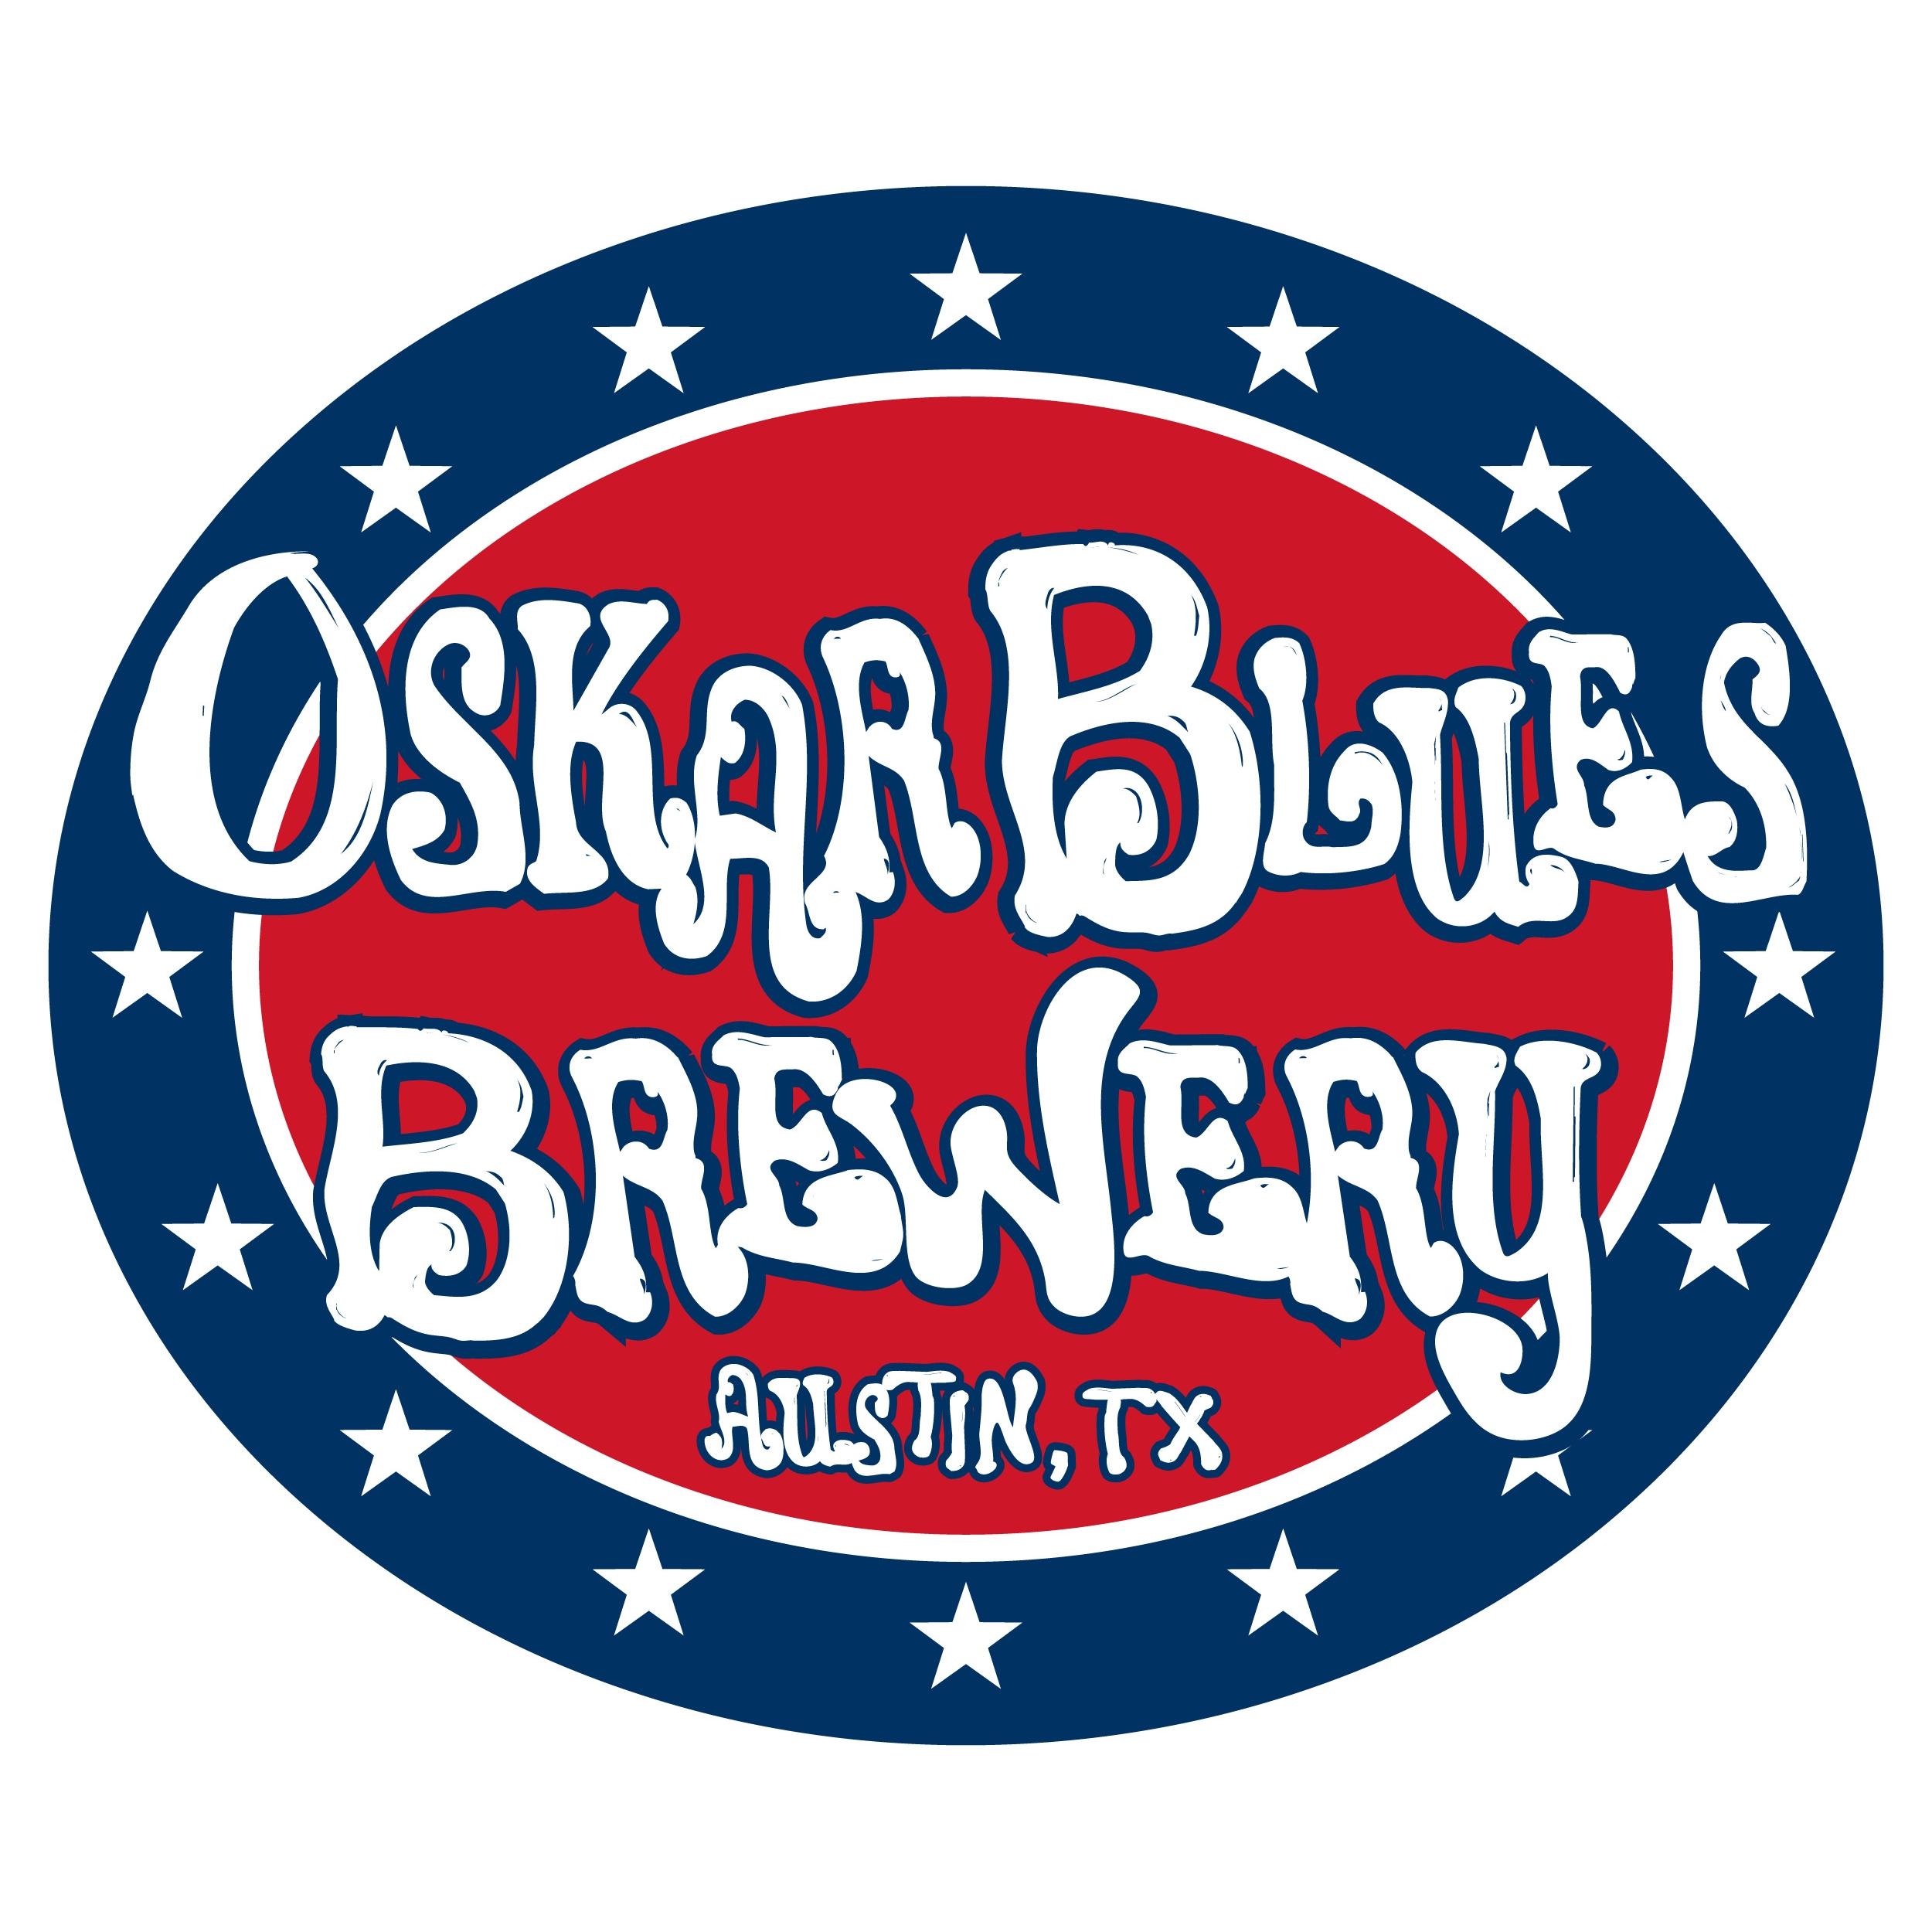 Hot Pickin 57s, bluegrass and country at Oskar Blues ATX